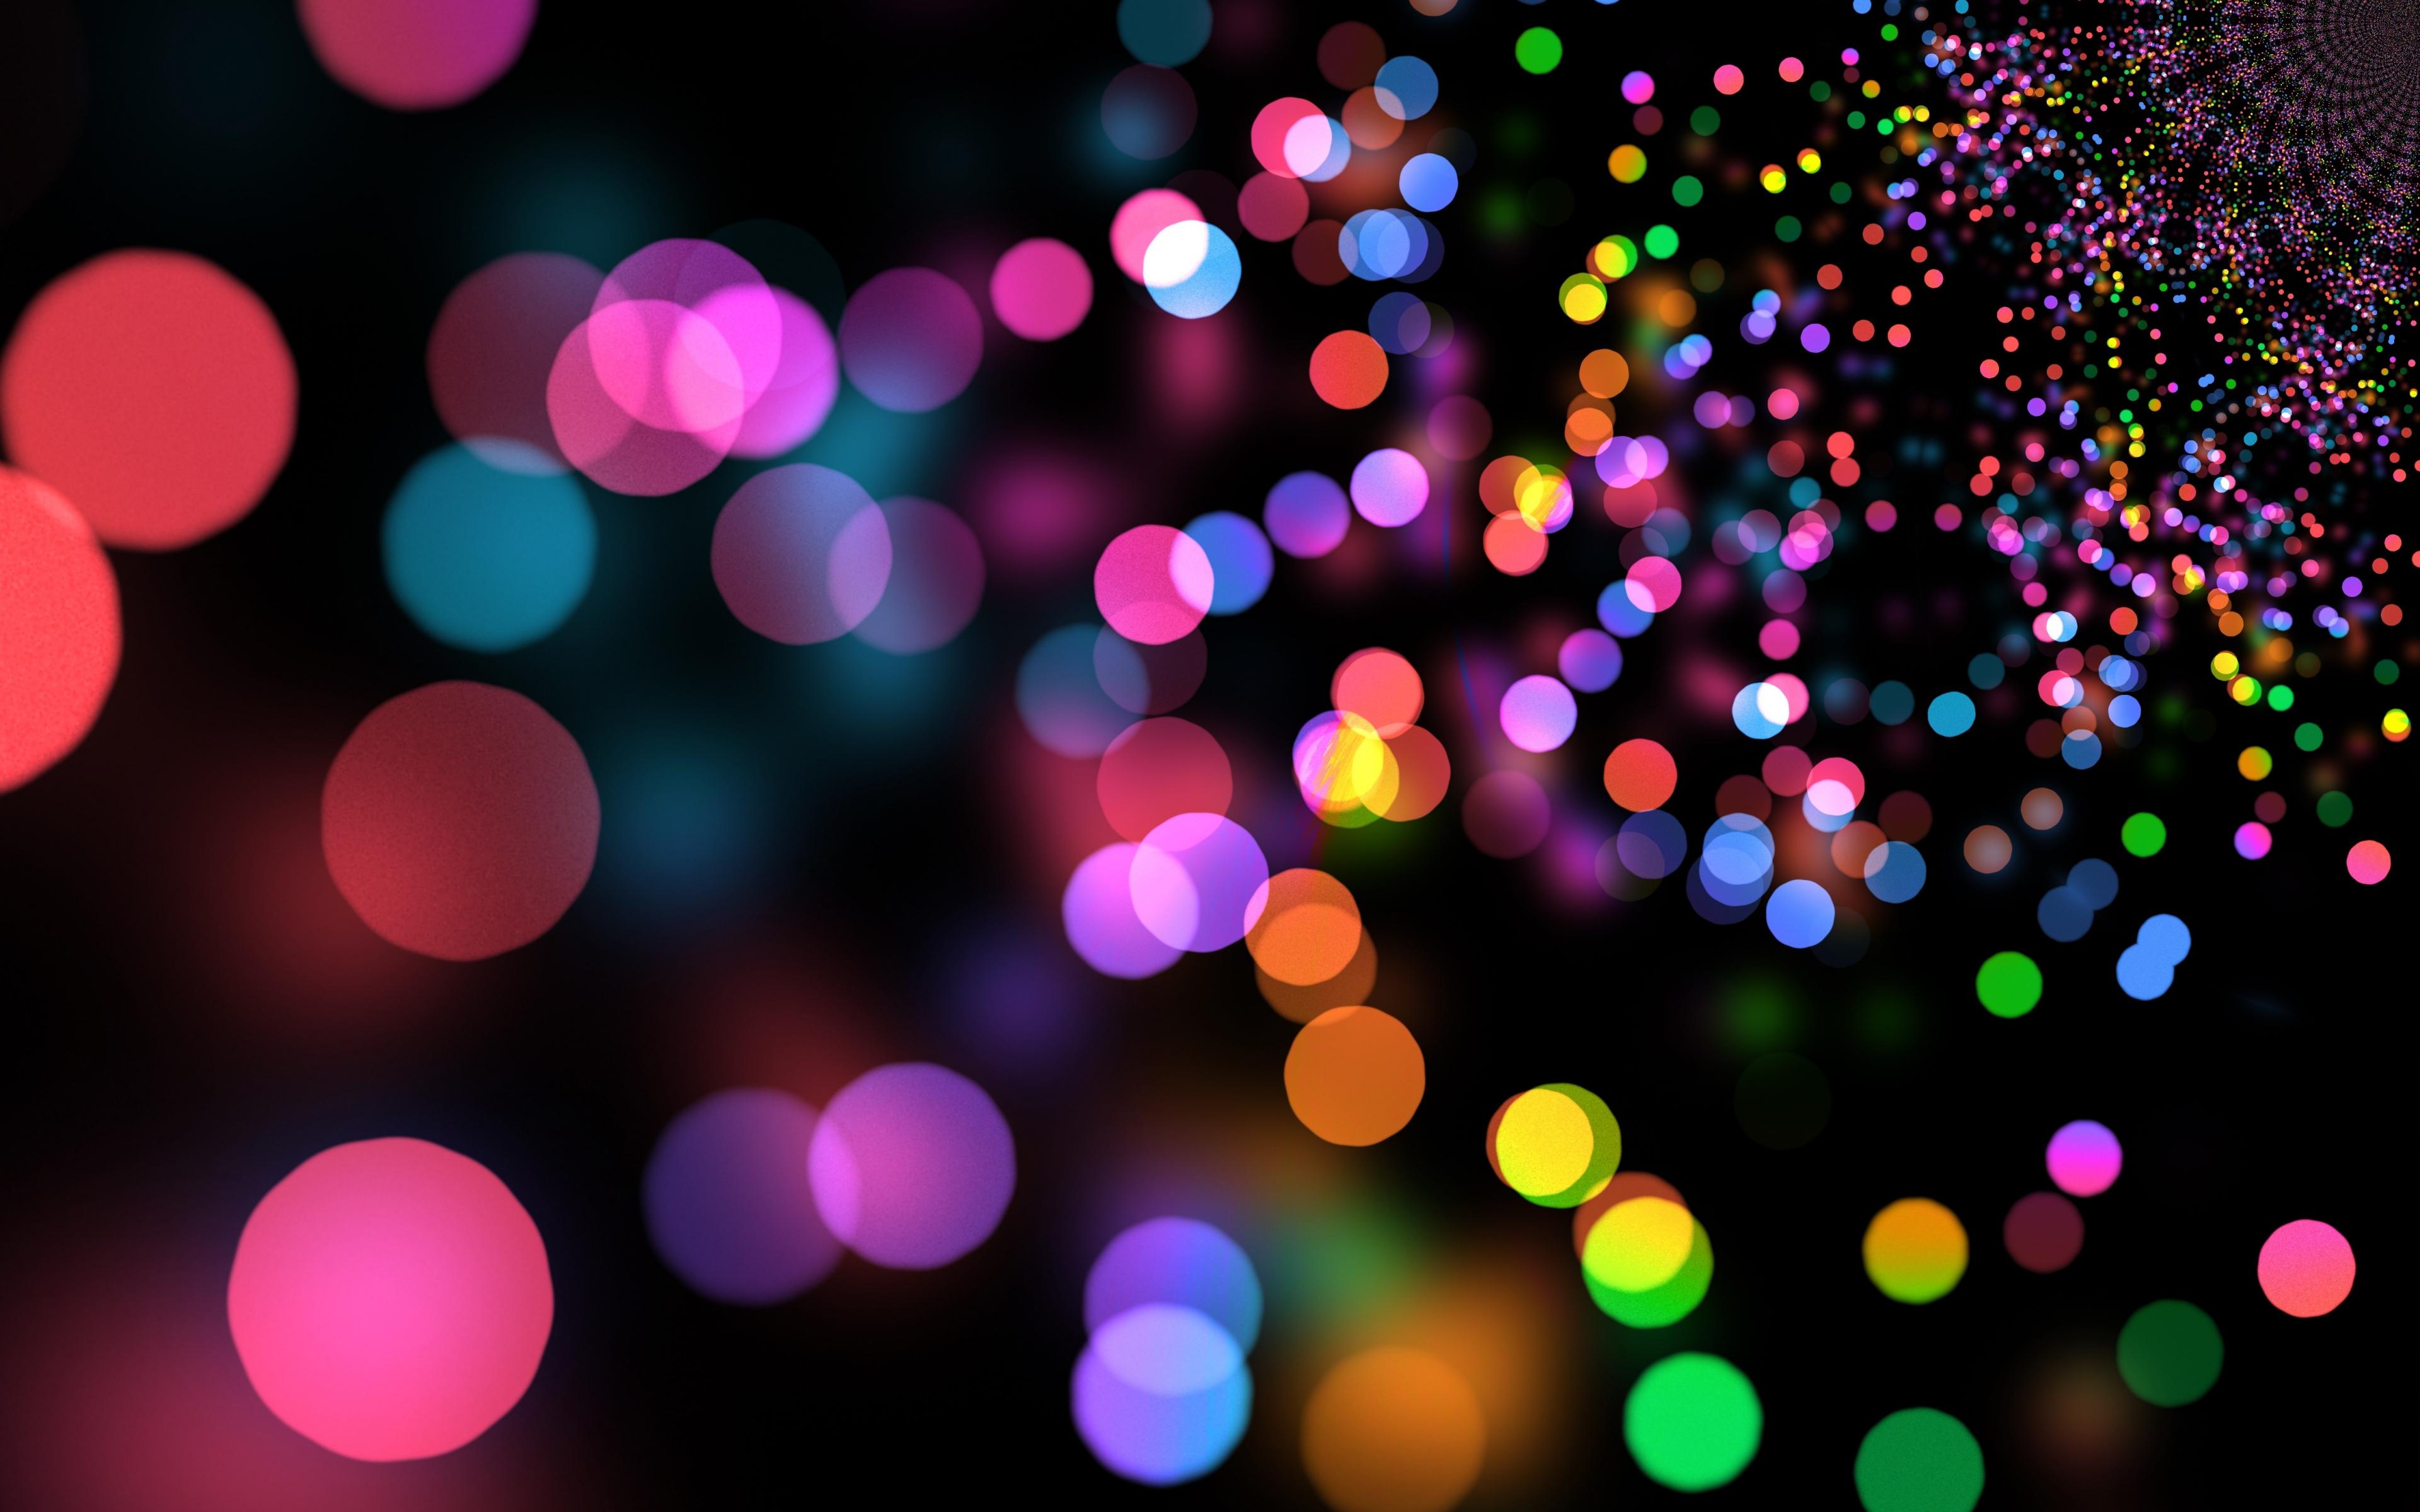 Party lights, circles, colorful, bokeh, 3840x2400 wallpaper